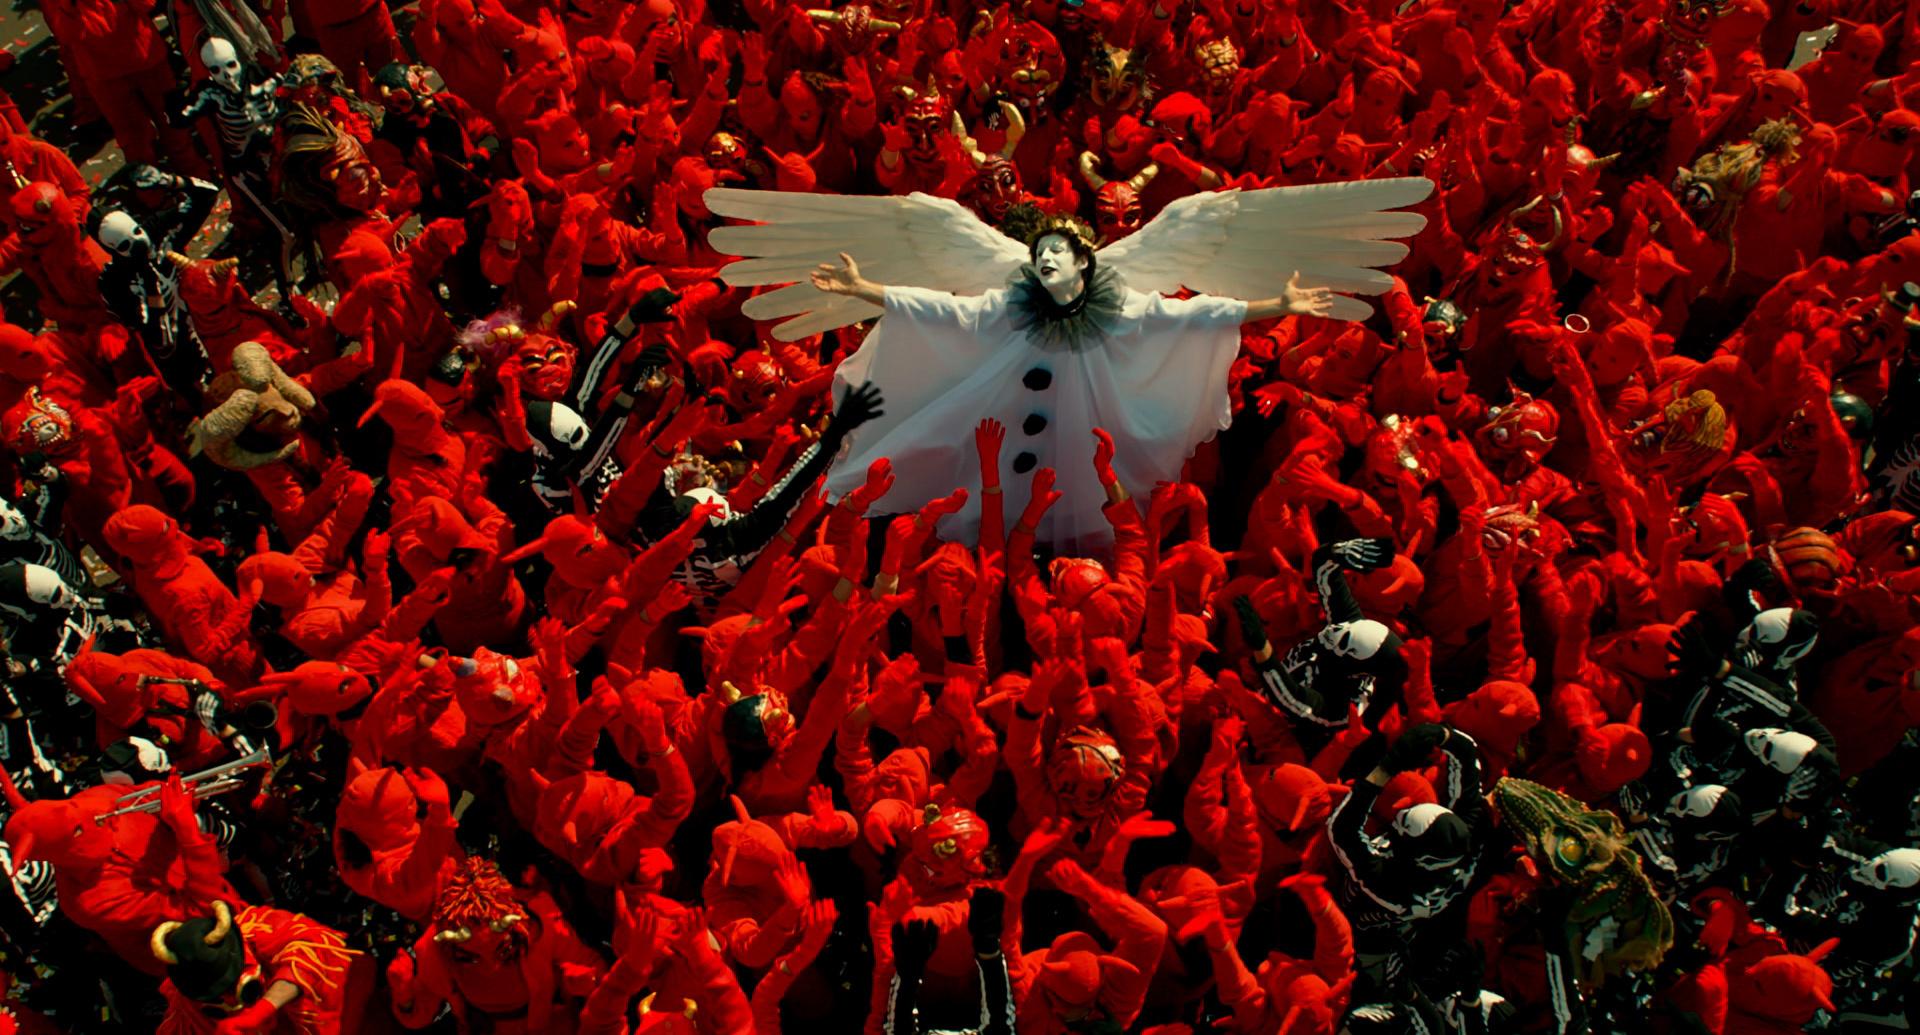 Cineforum Labirinto presenta Poesia Sin Fin di Jodorowsky in anteprima regionale